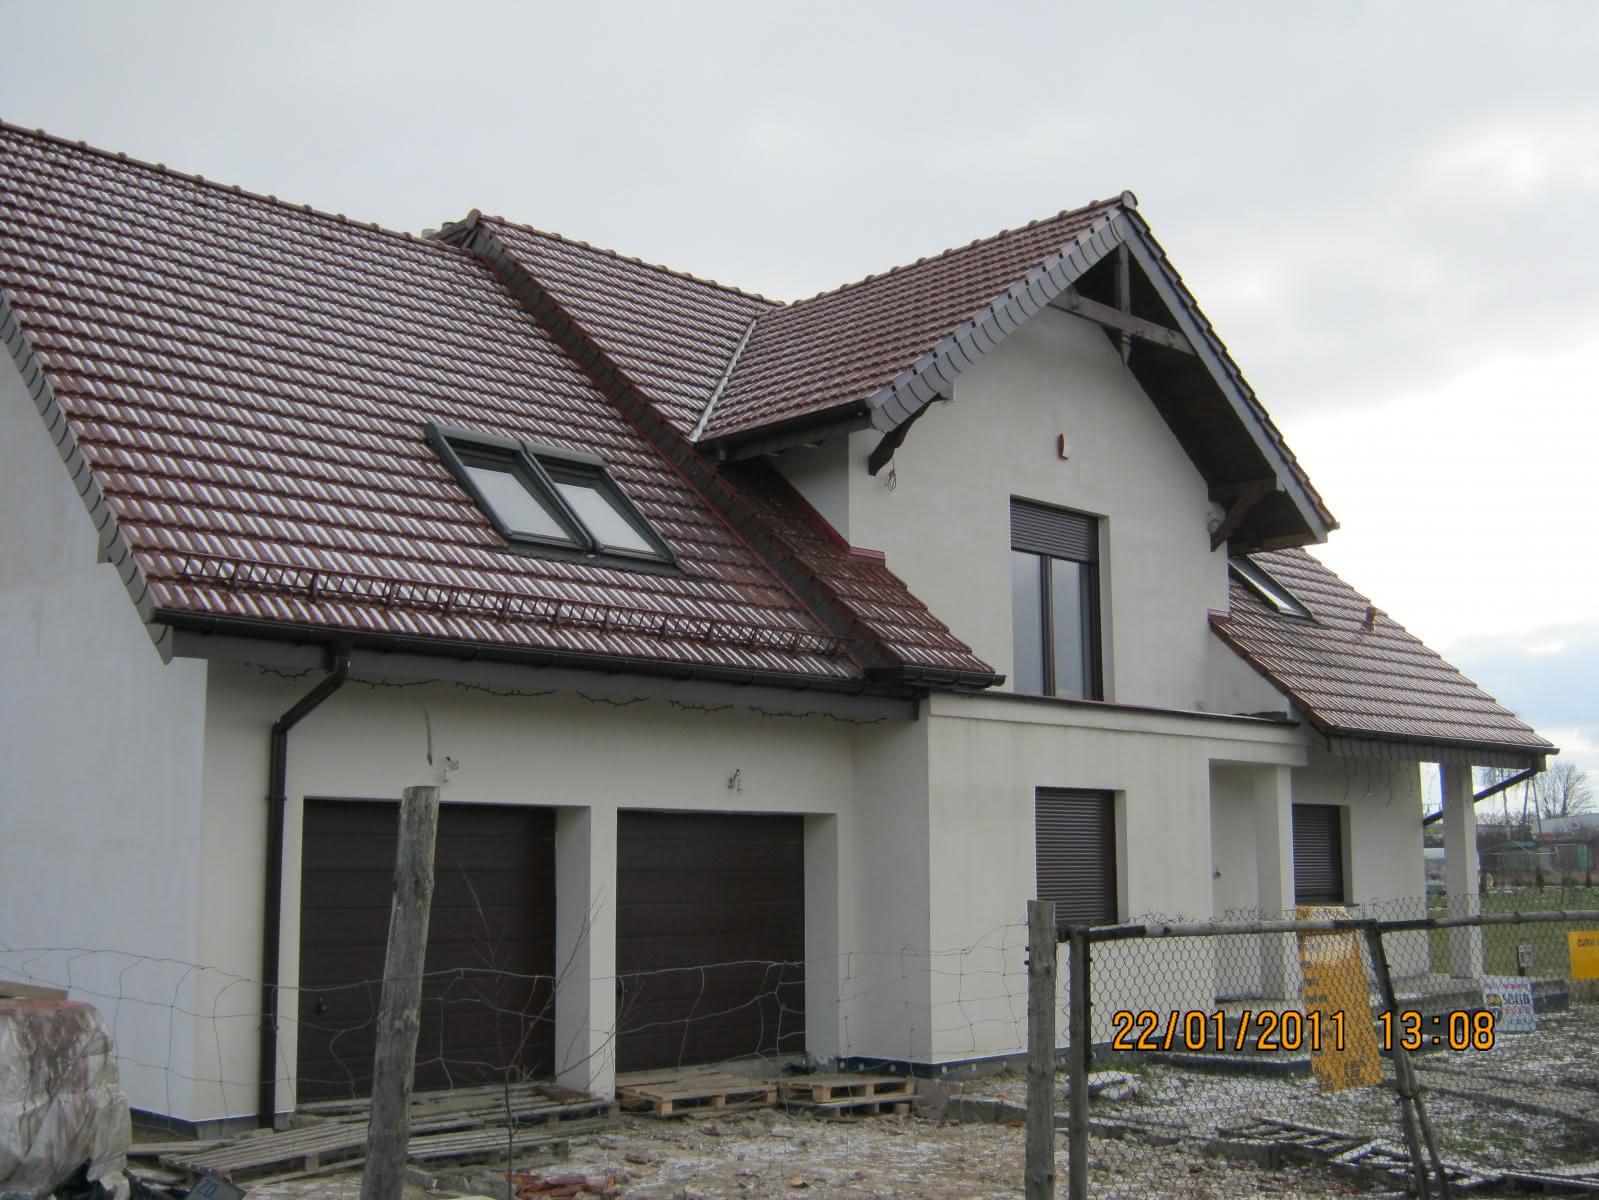 Dom po ociepleniu